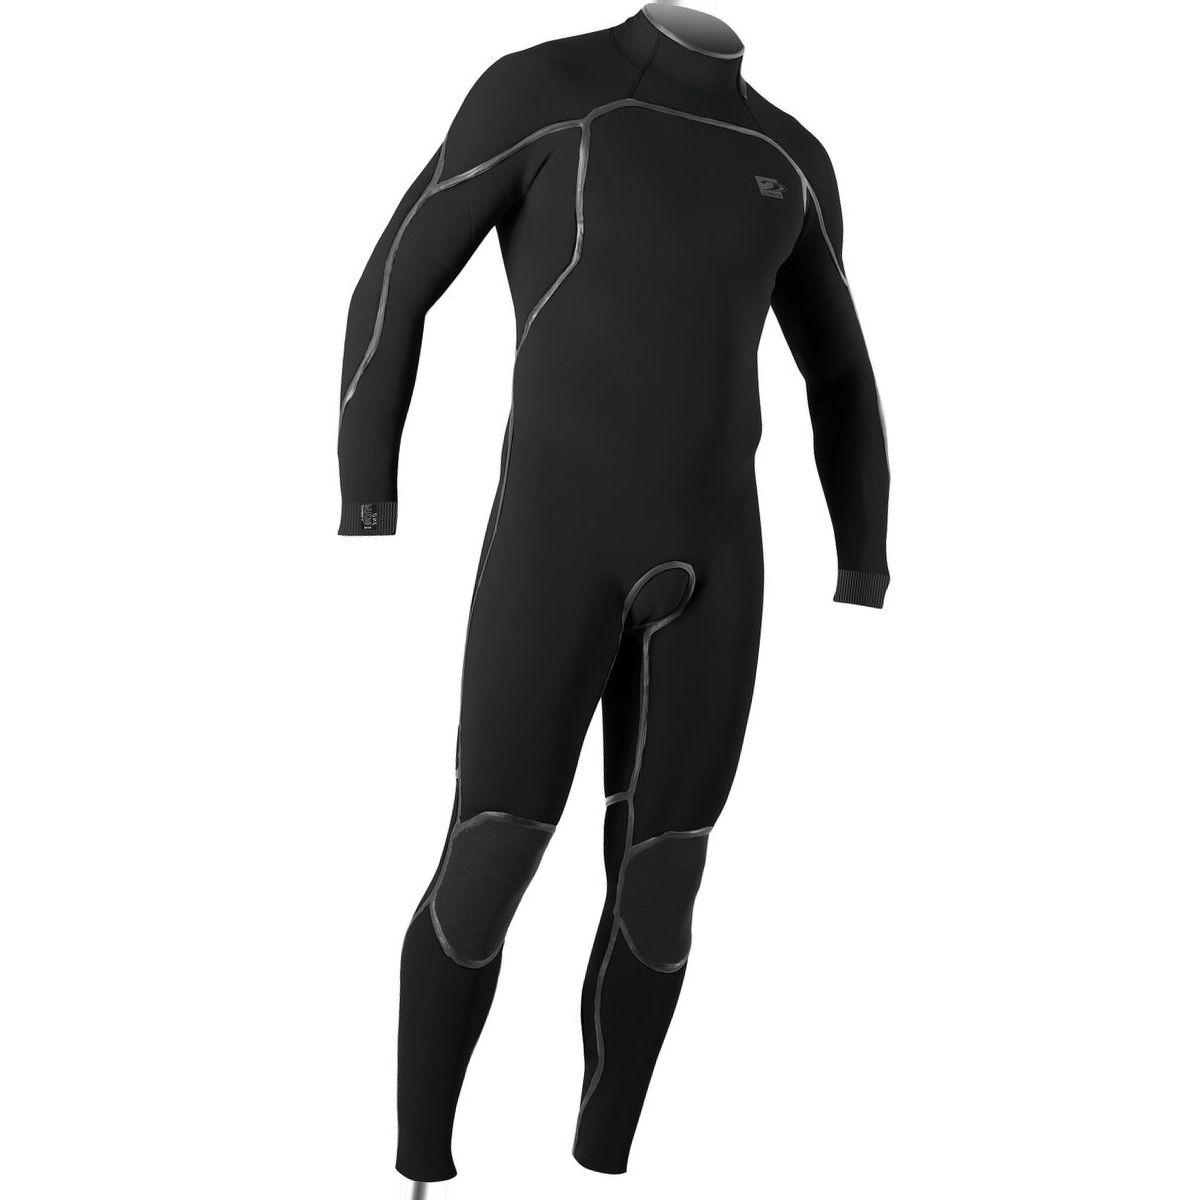 O'Neill Psycho One 4/3mm Back-Zip Full Wetsuit - Men's